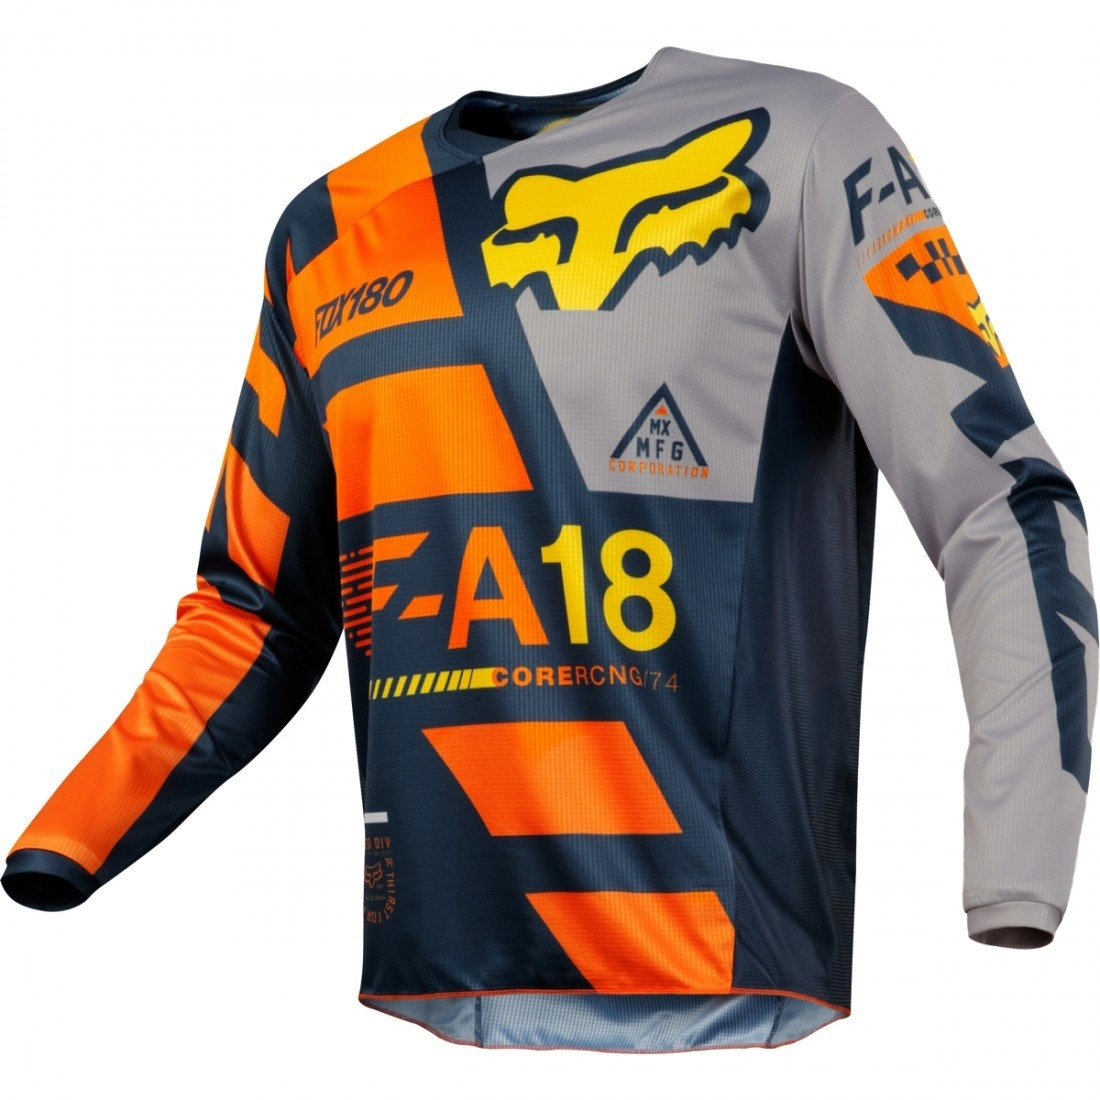 Camiseta FOX 180 2018 Junior Sayak Orange · Motocard 600e1d65f908e